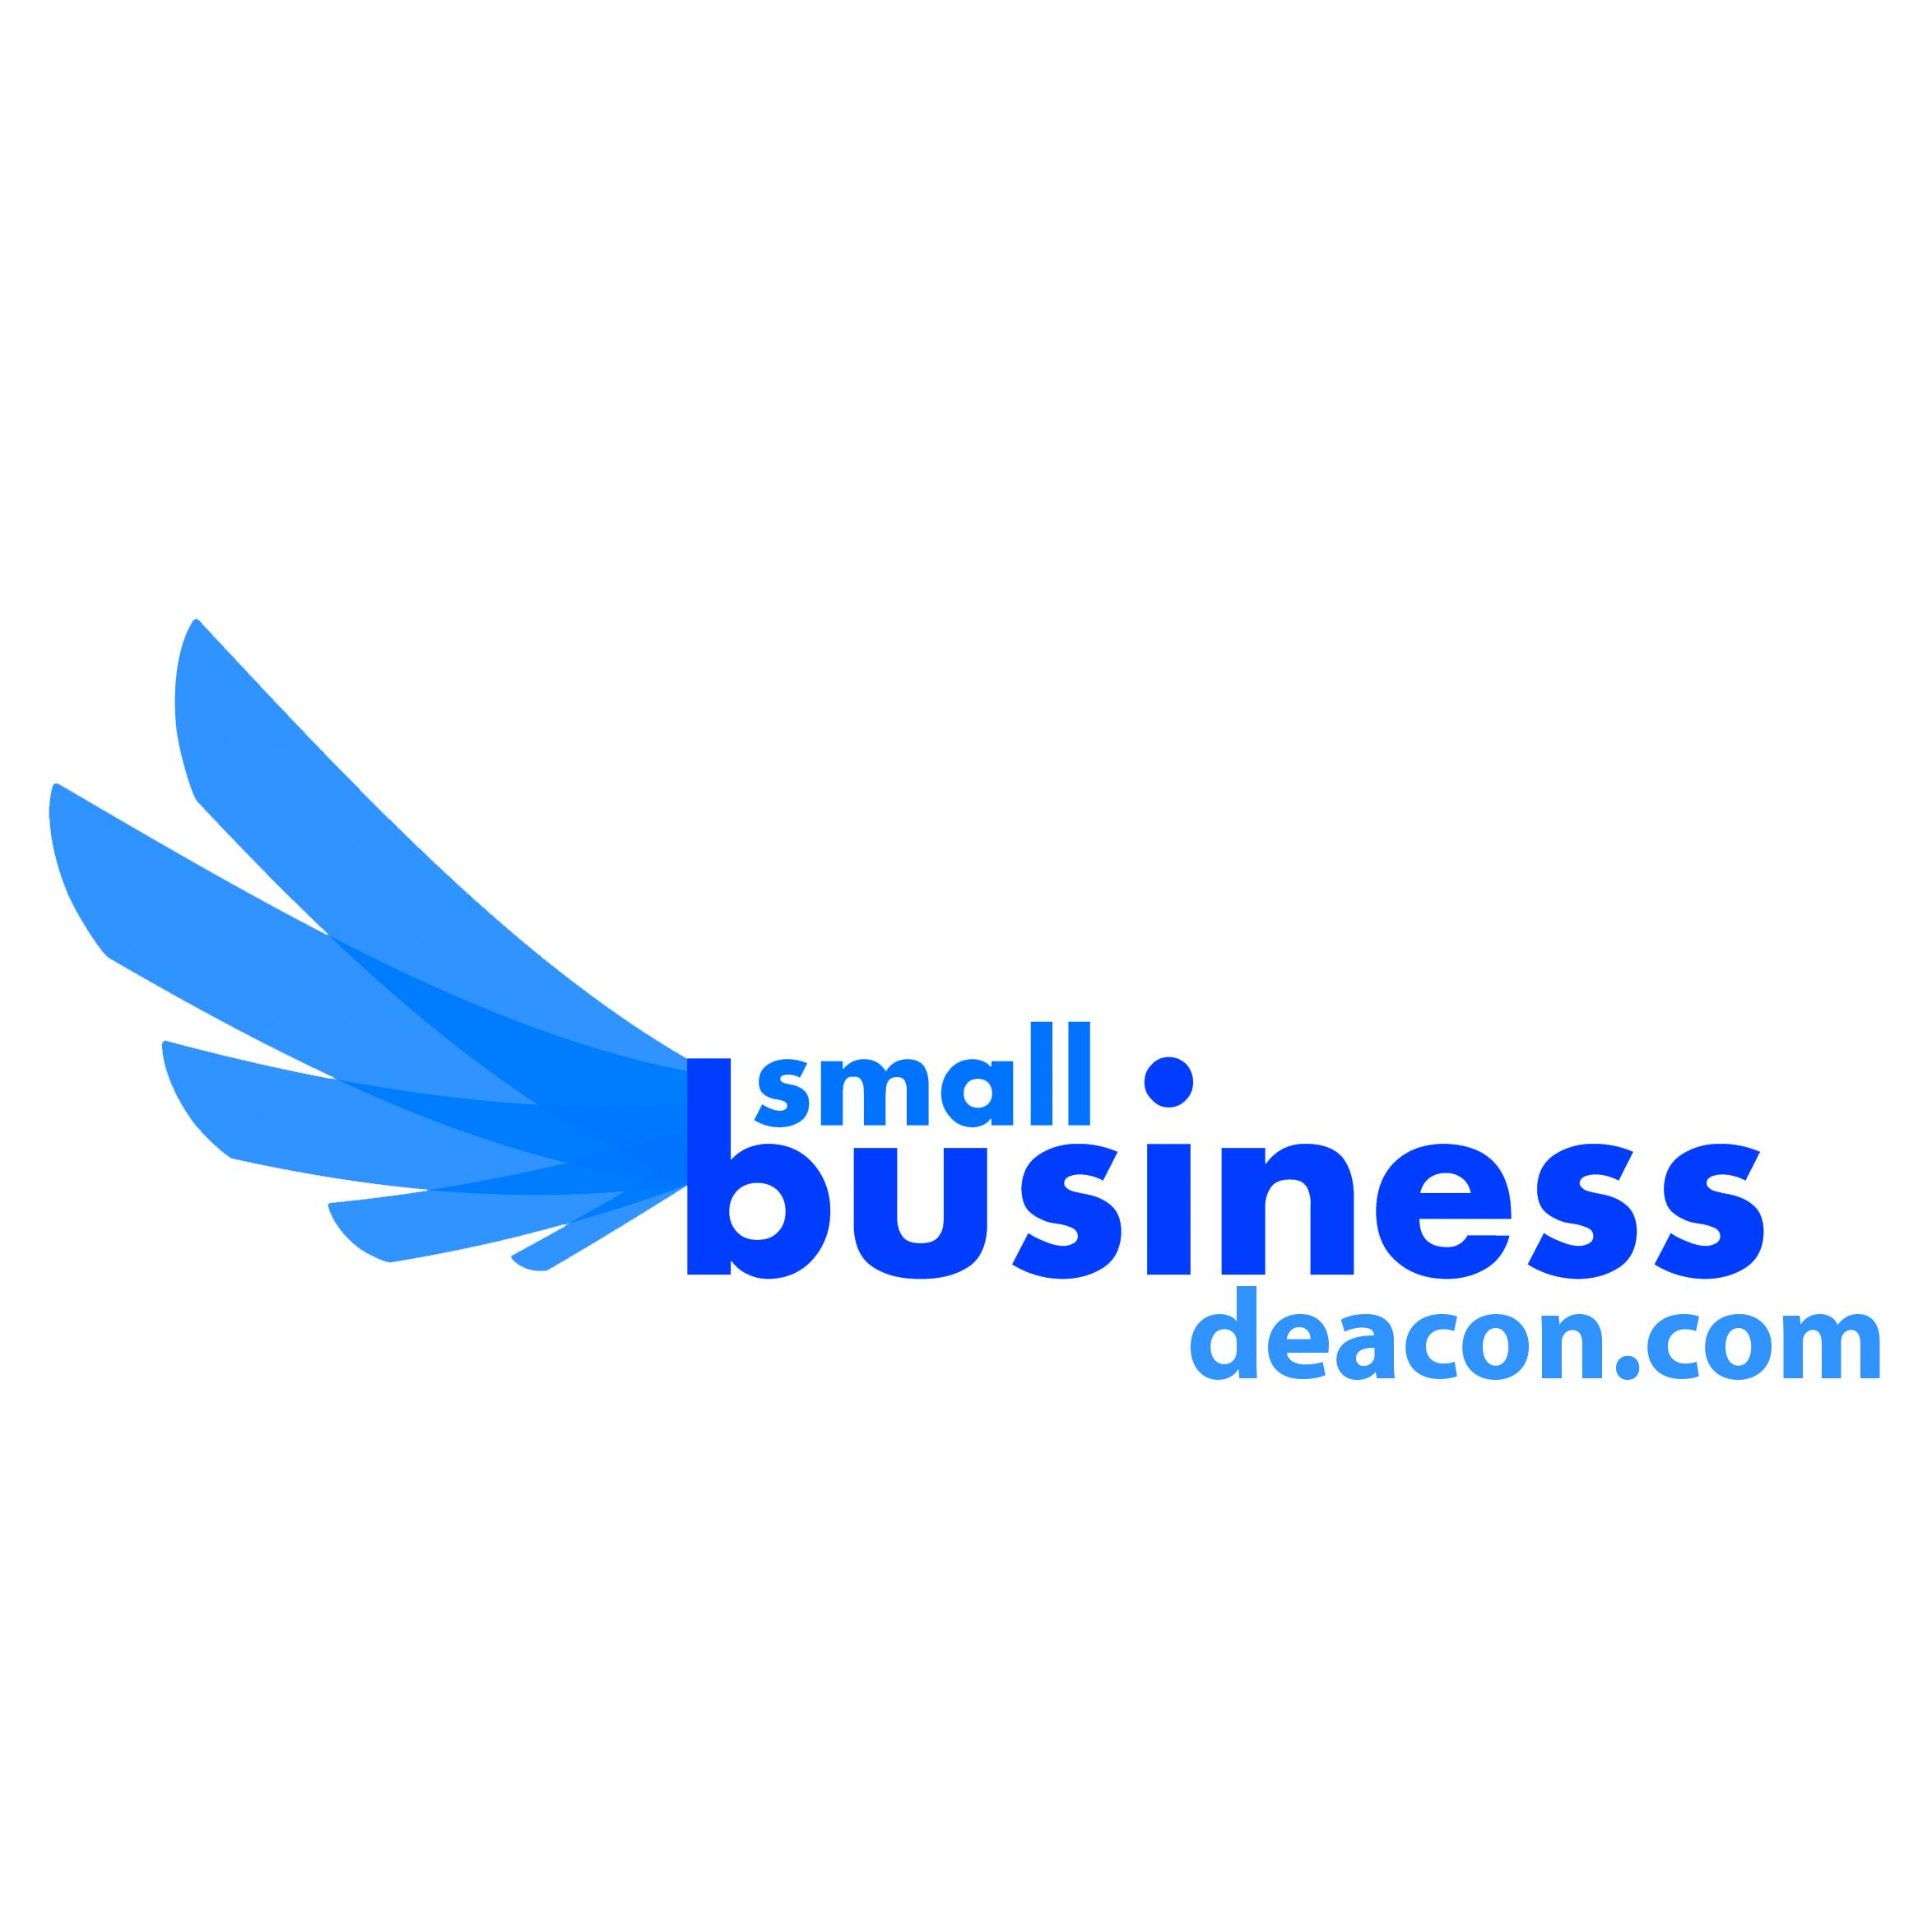 Small Business Deacon